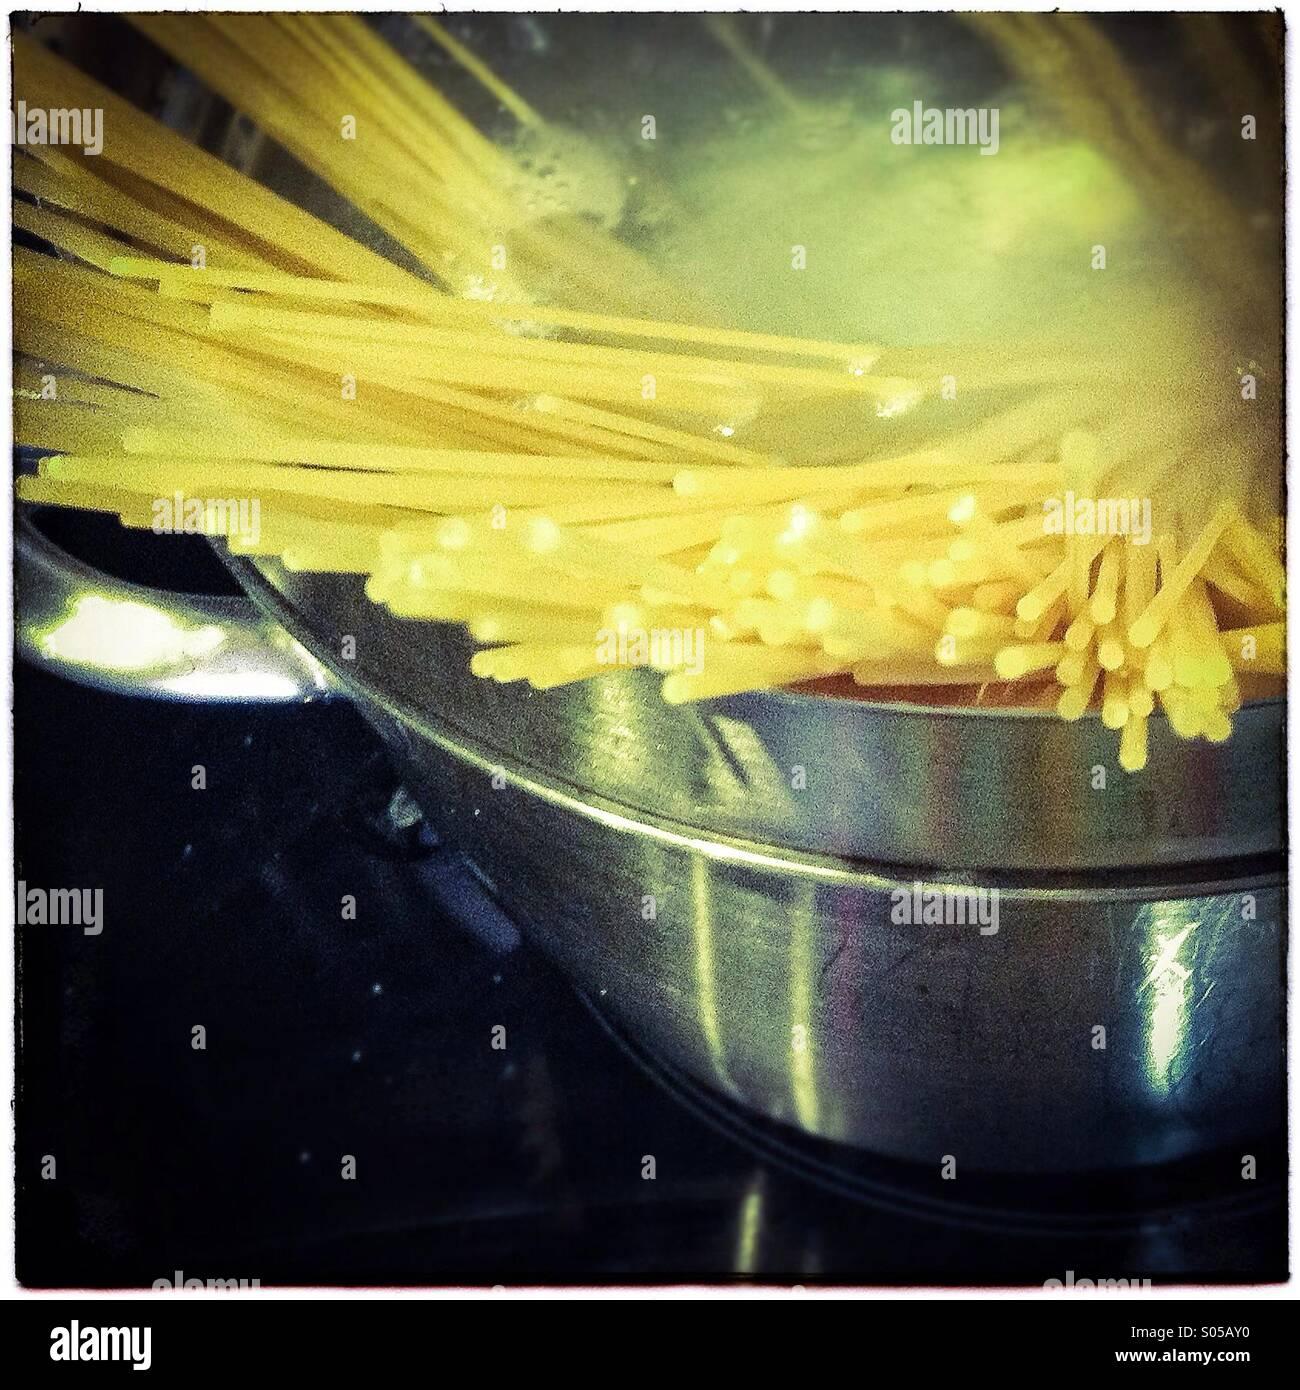 Gluten free spaghetti pasta boiling - Stock Image